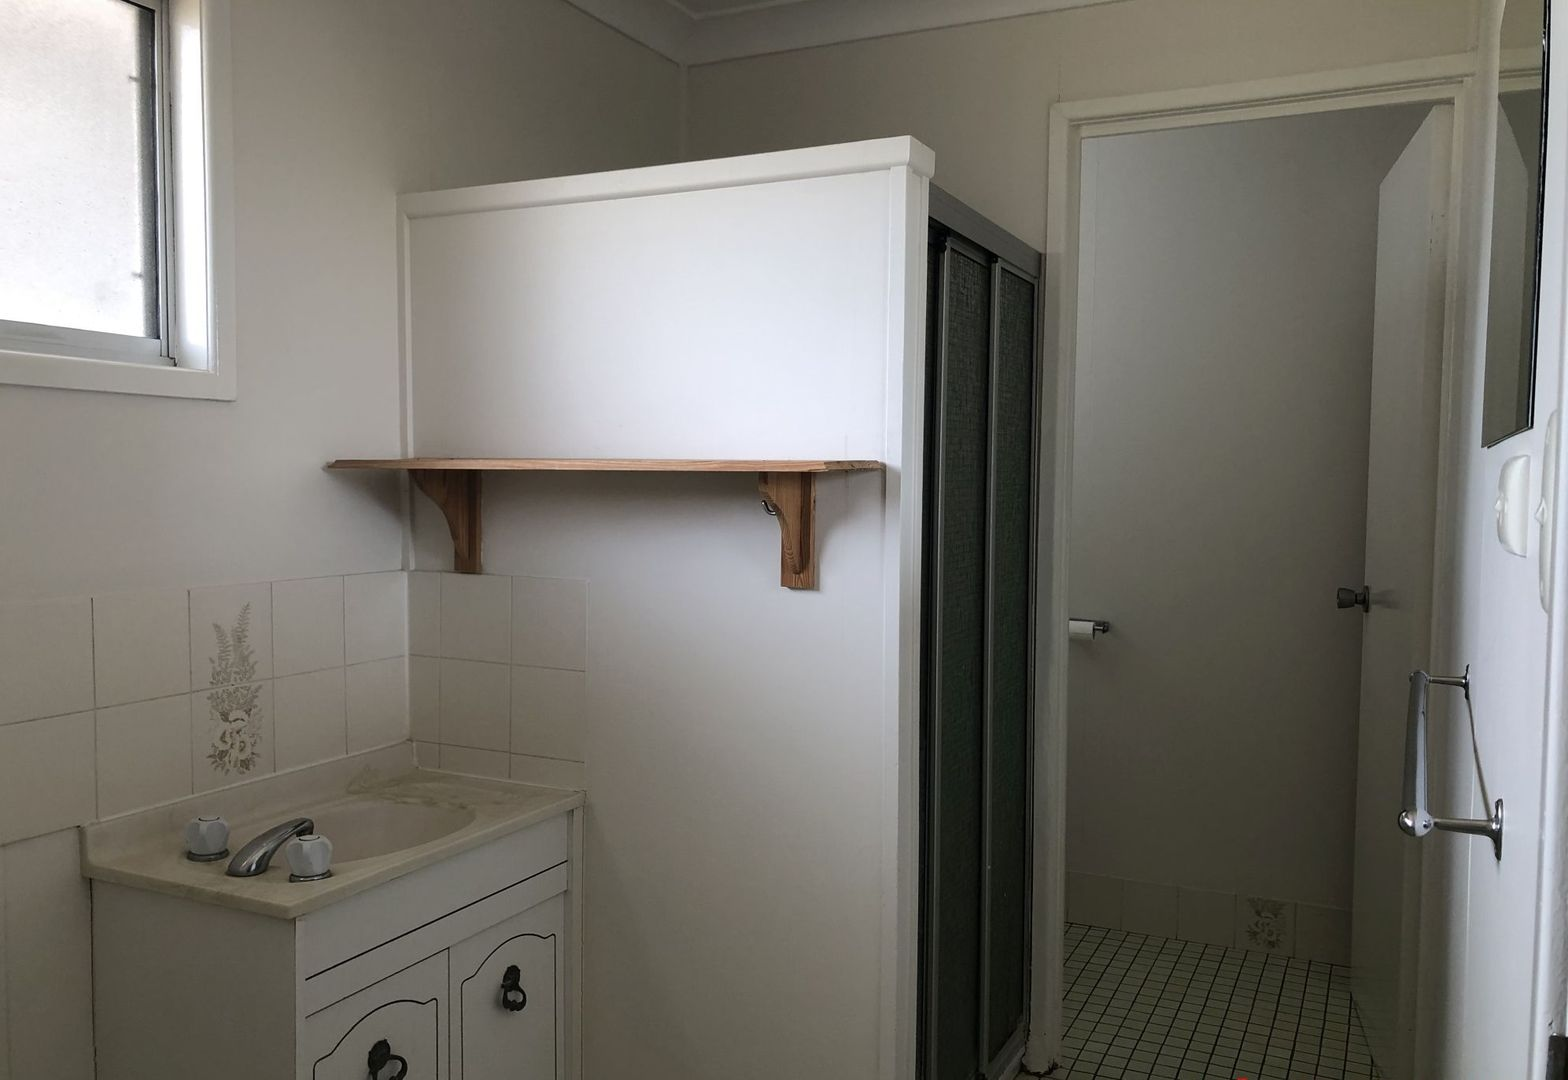 3/100 Drayton Street, Dalby QLD 4405, Image 2